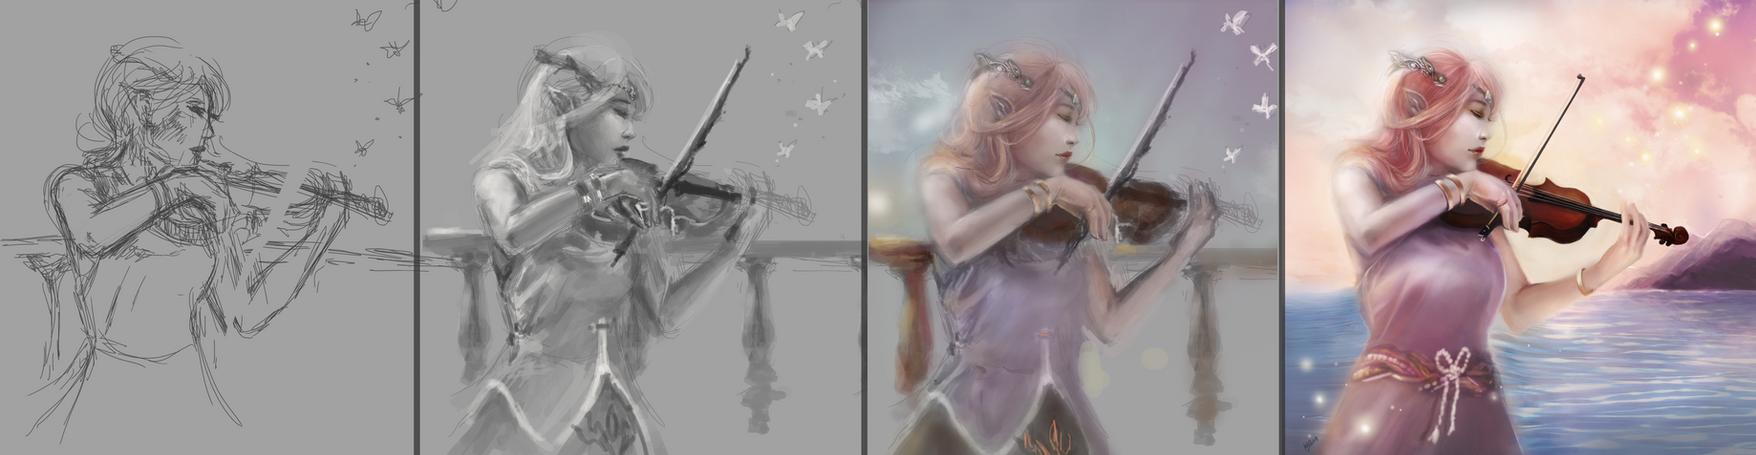 Violinist Progression Pic by kshah